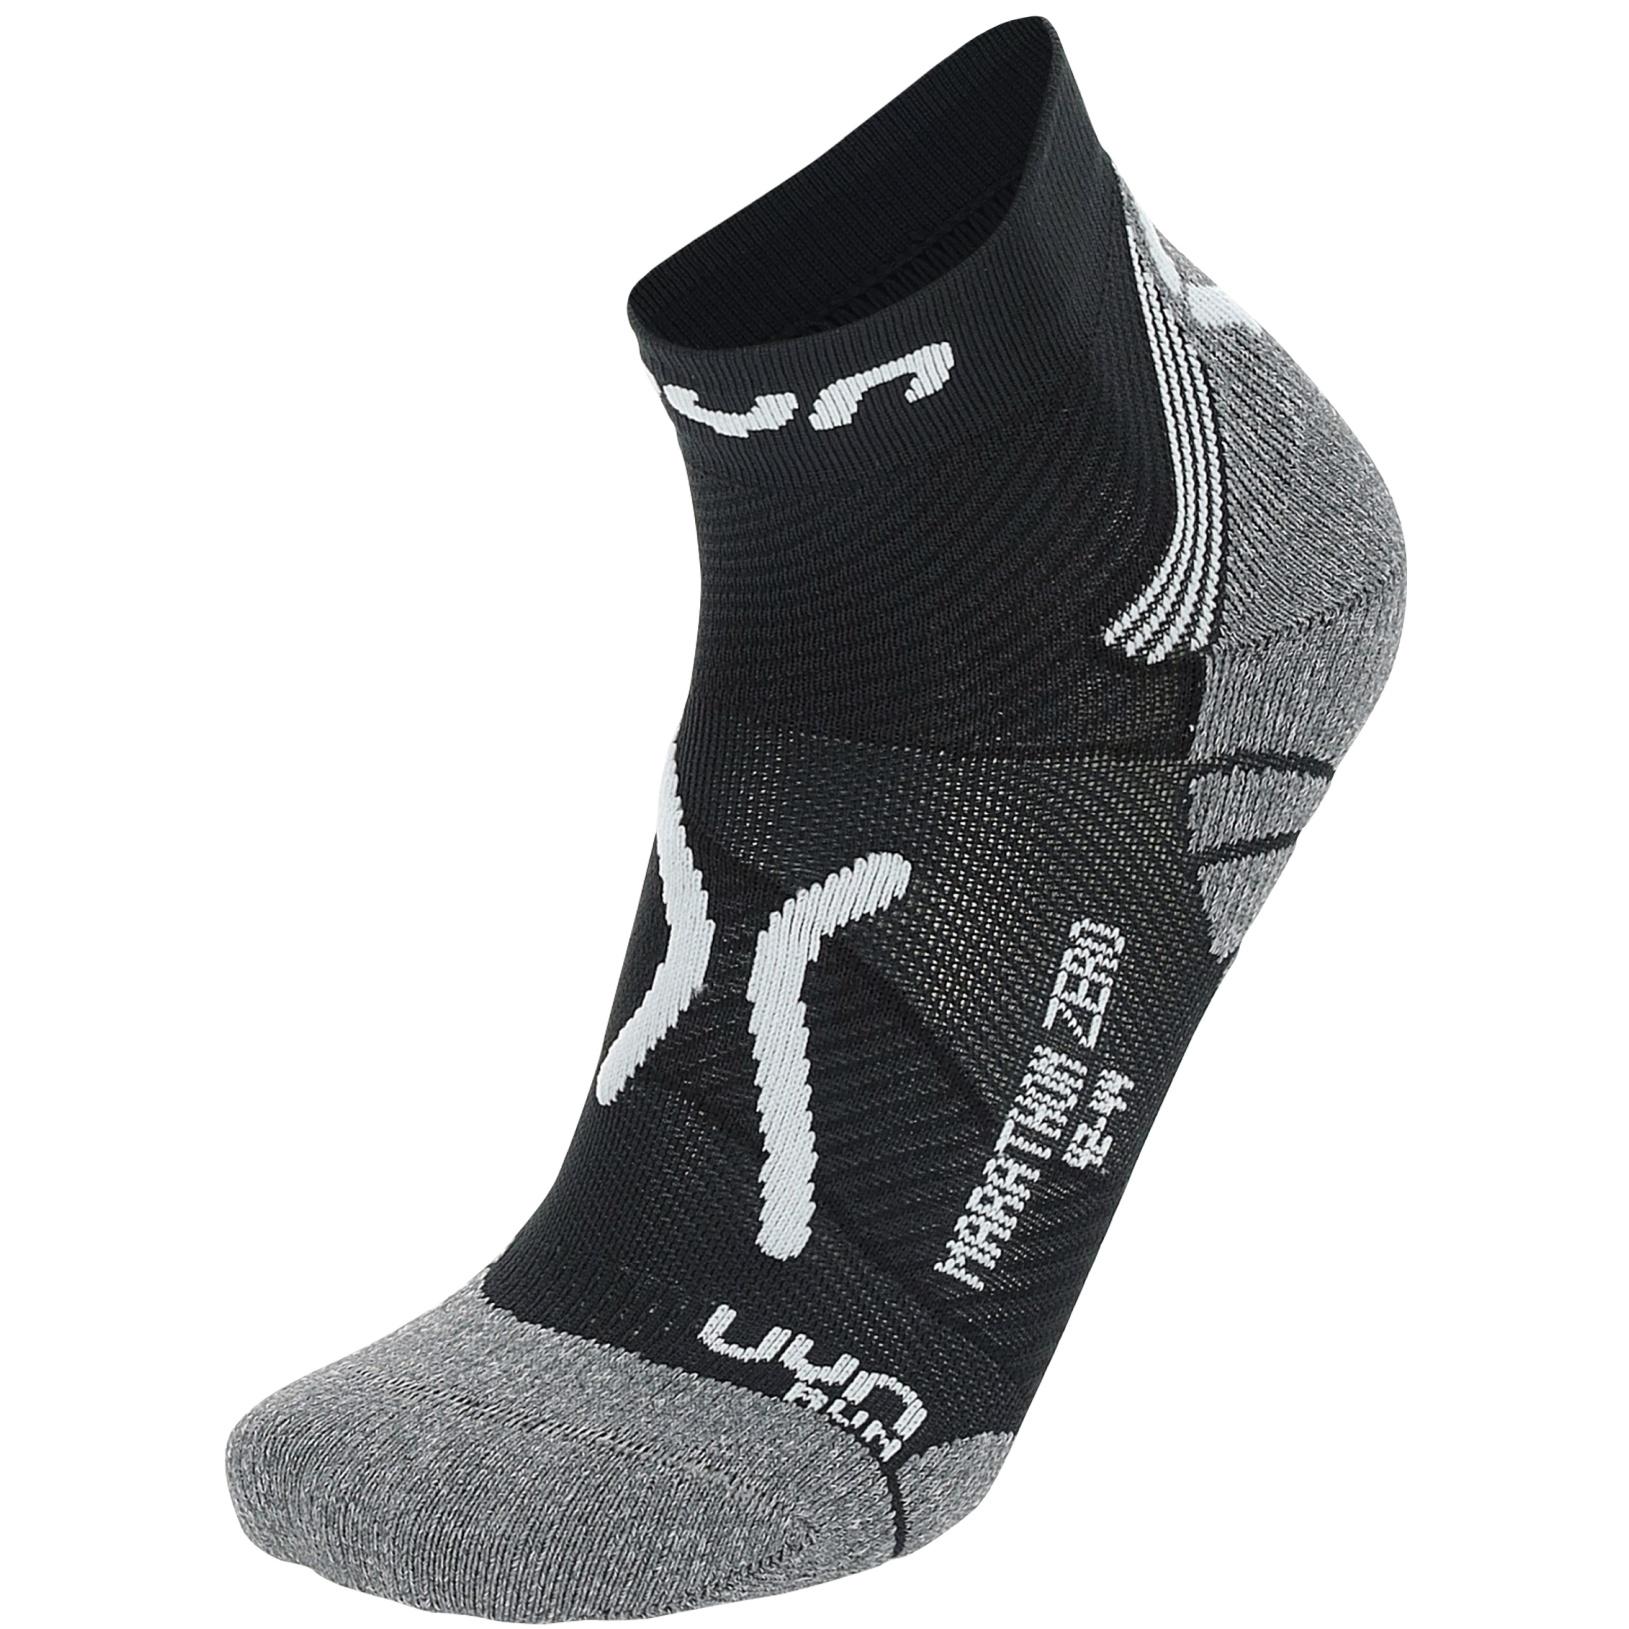 UYN Marathon Zero Herren Runningsocken - Black/White/Grey